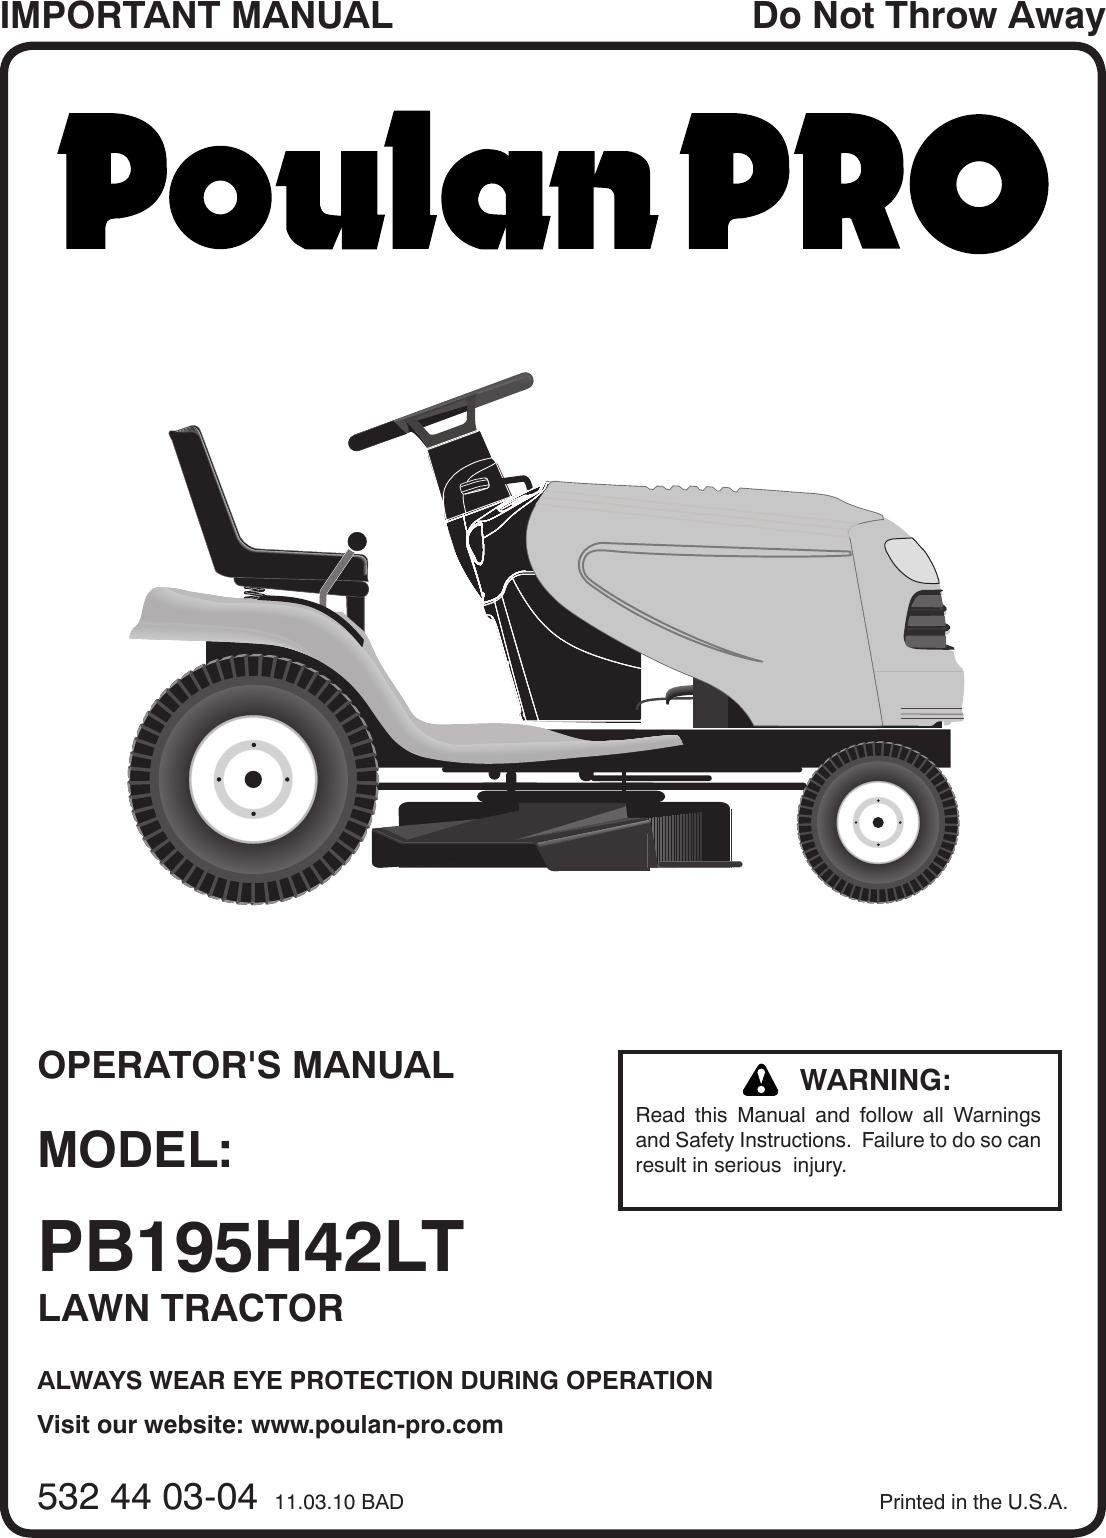 Poulan Pro Pb195H42Lt Users Manual OM, PB195H42LT, 2010 11